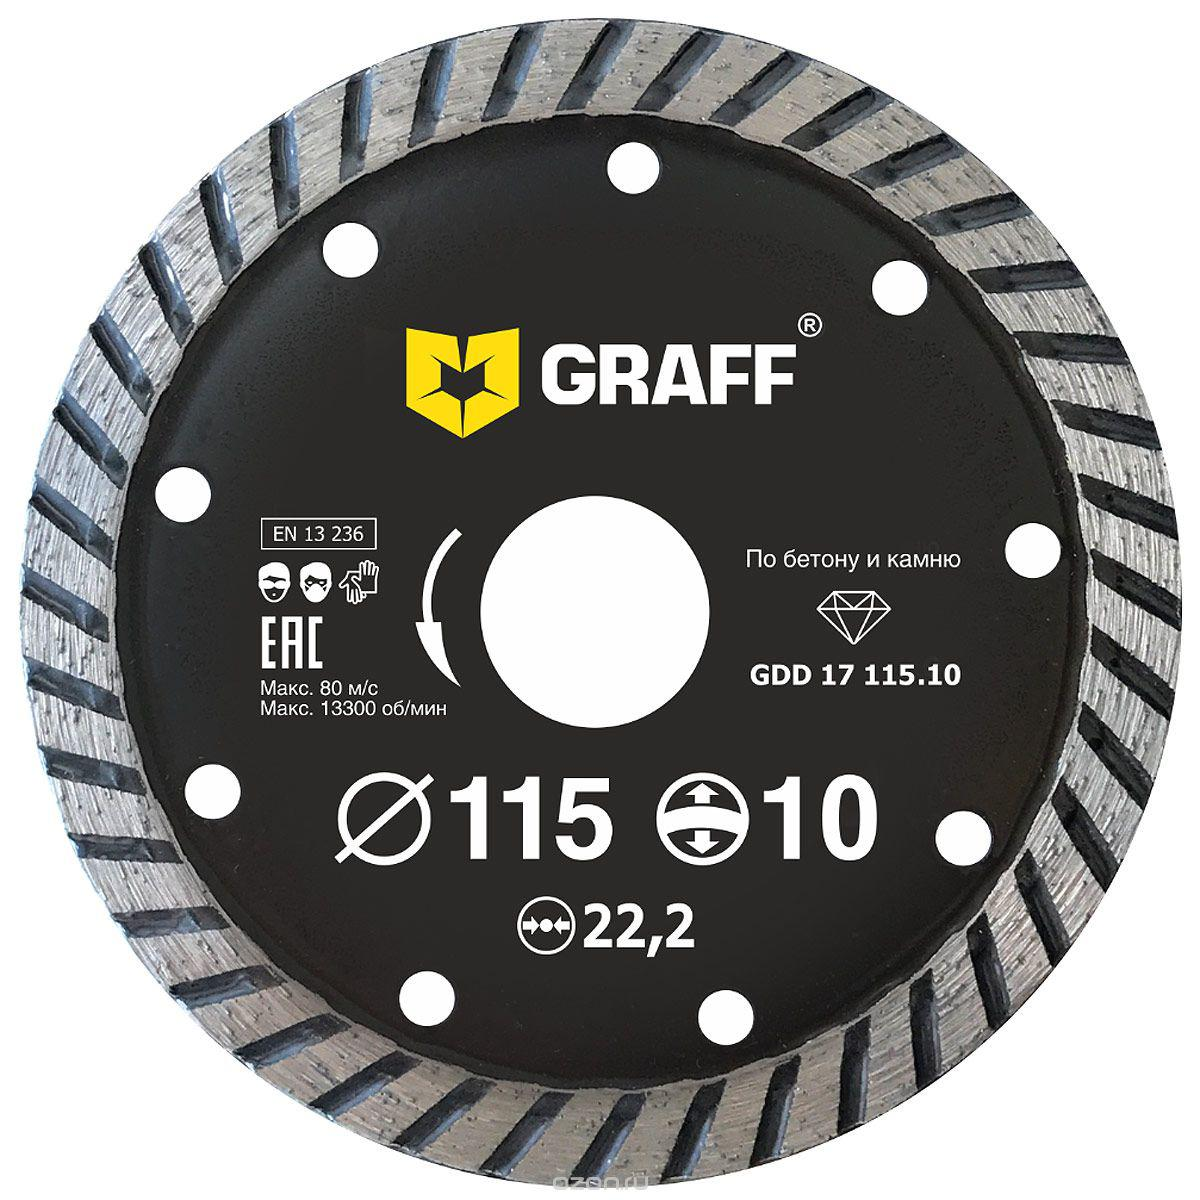 Картинка для Круг алмазный Graff Gdd 17 115.10